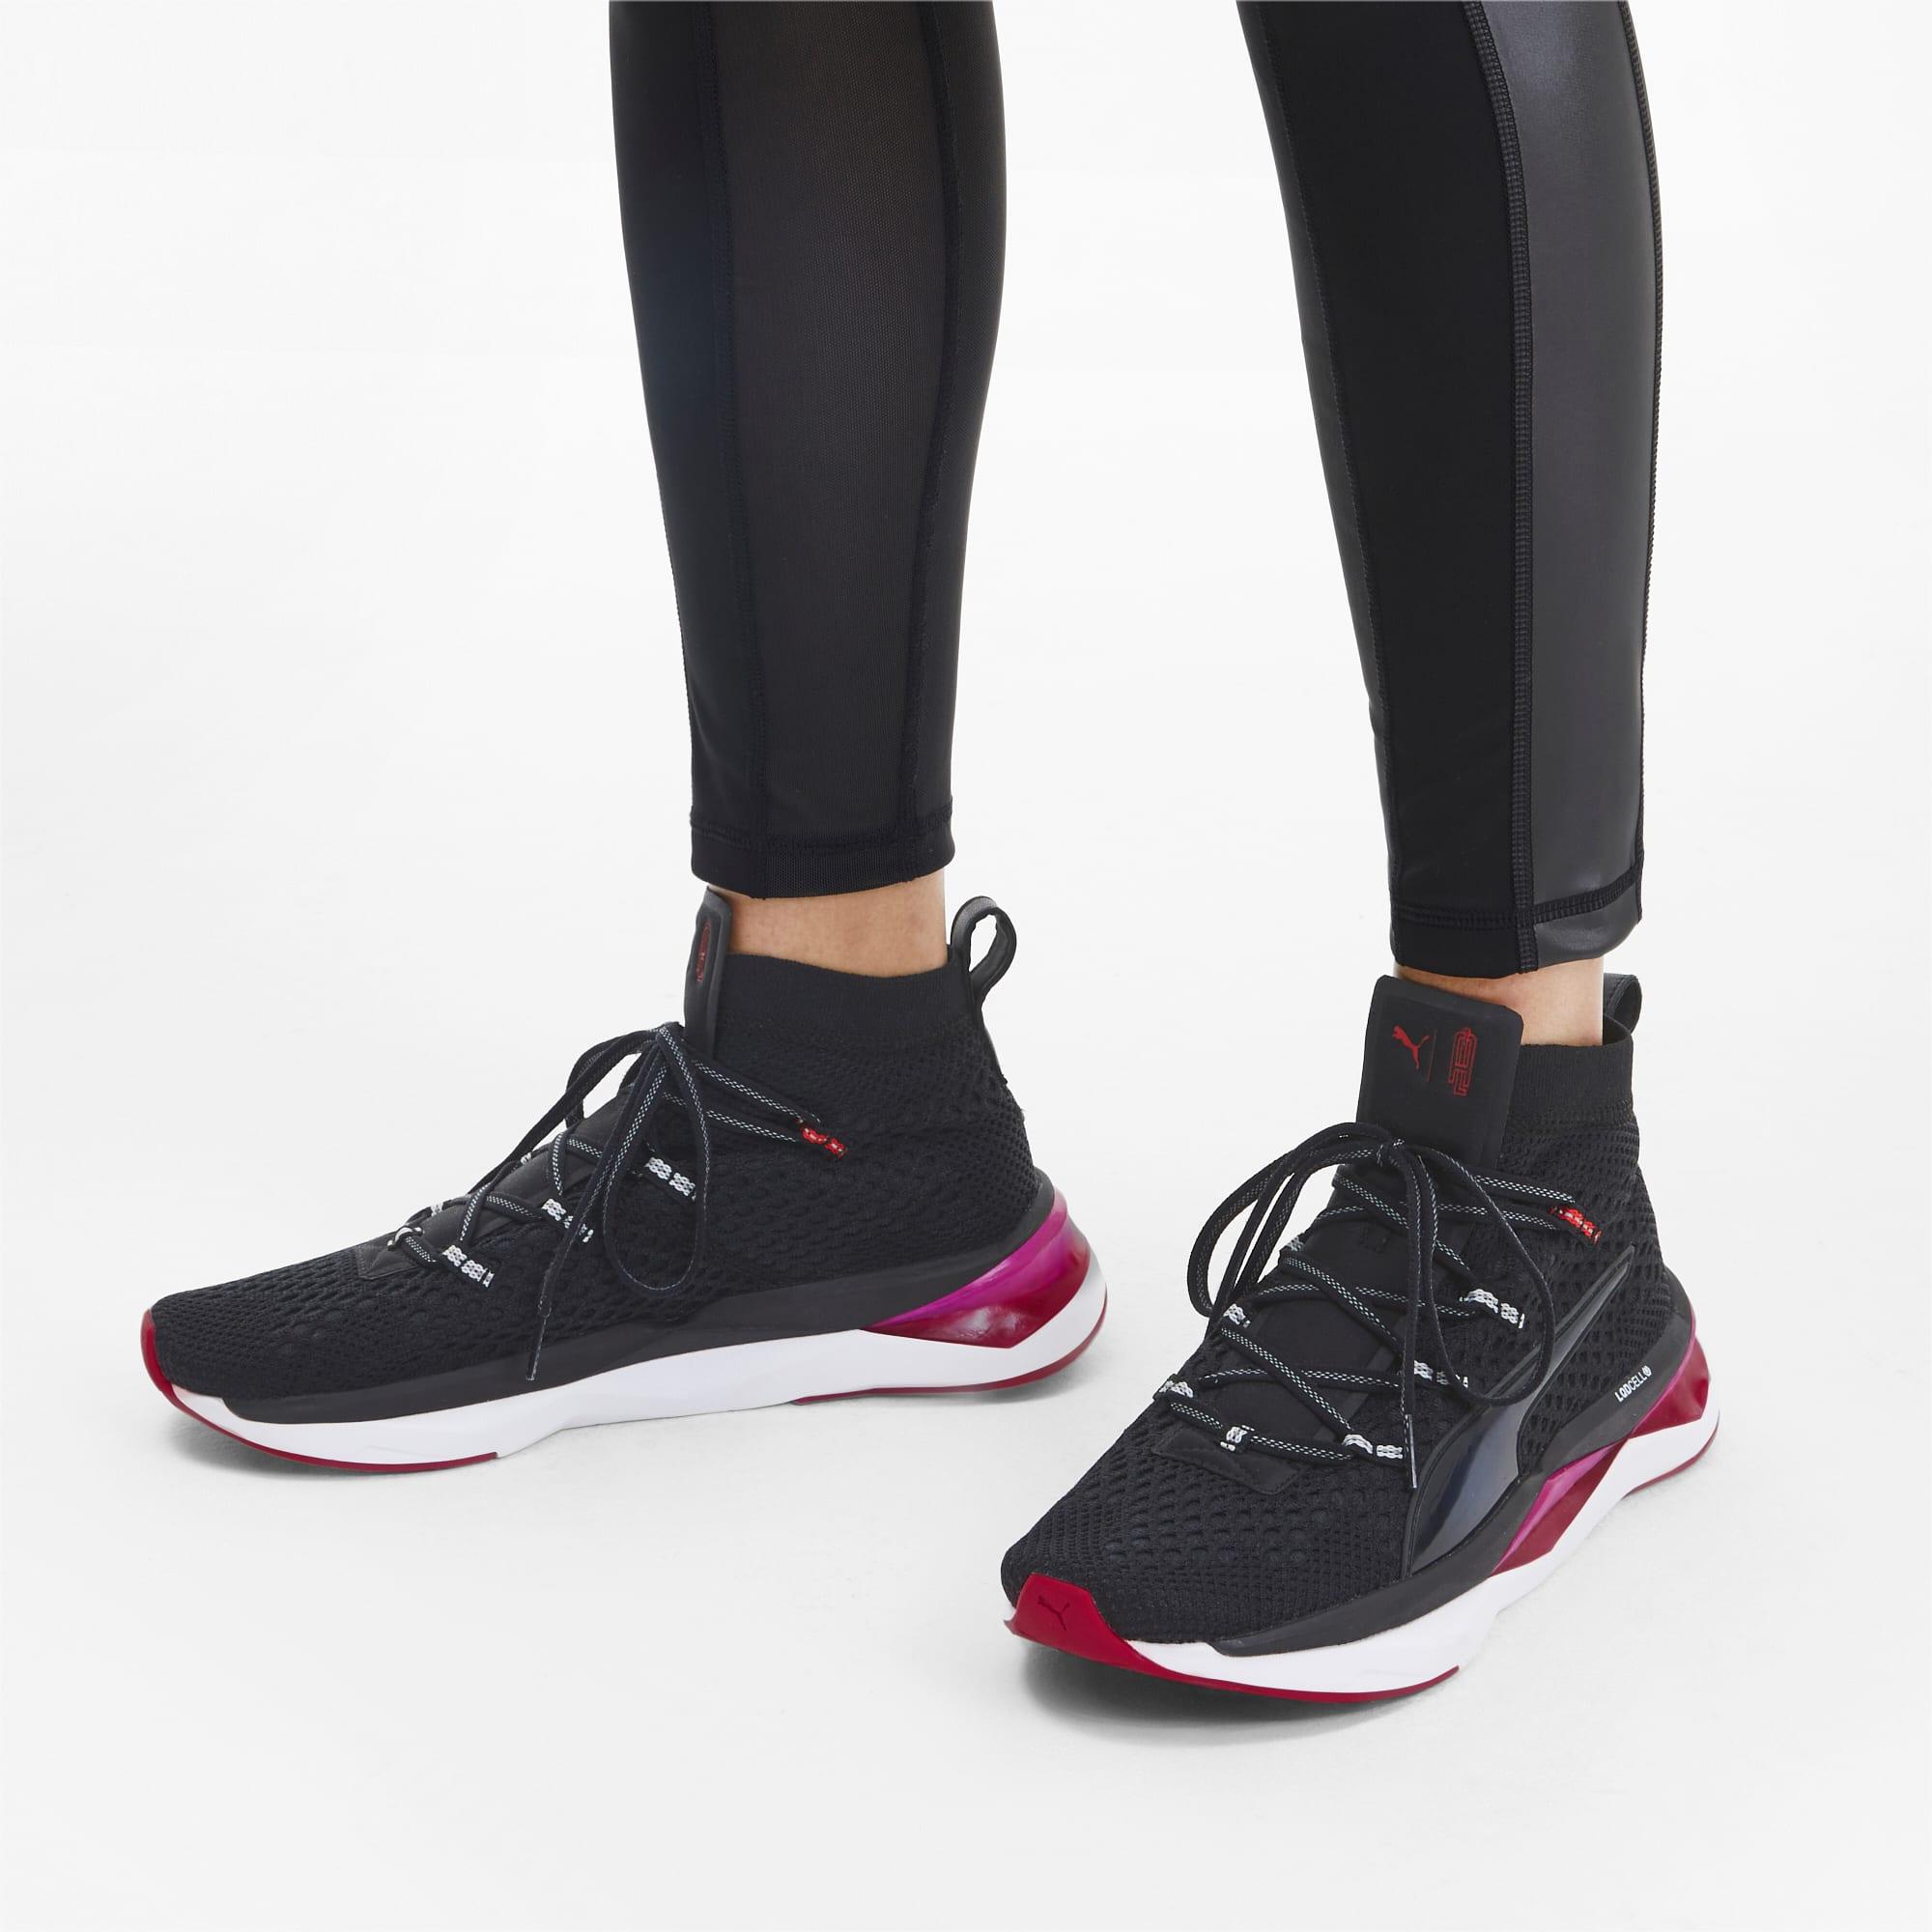 AL x PUMA LQDCELL Shatter XT Women's Training Shoes